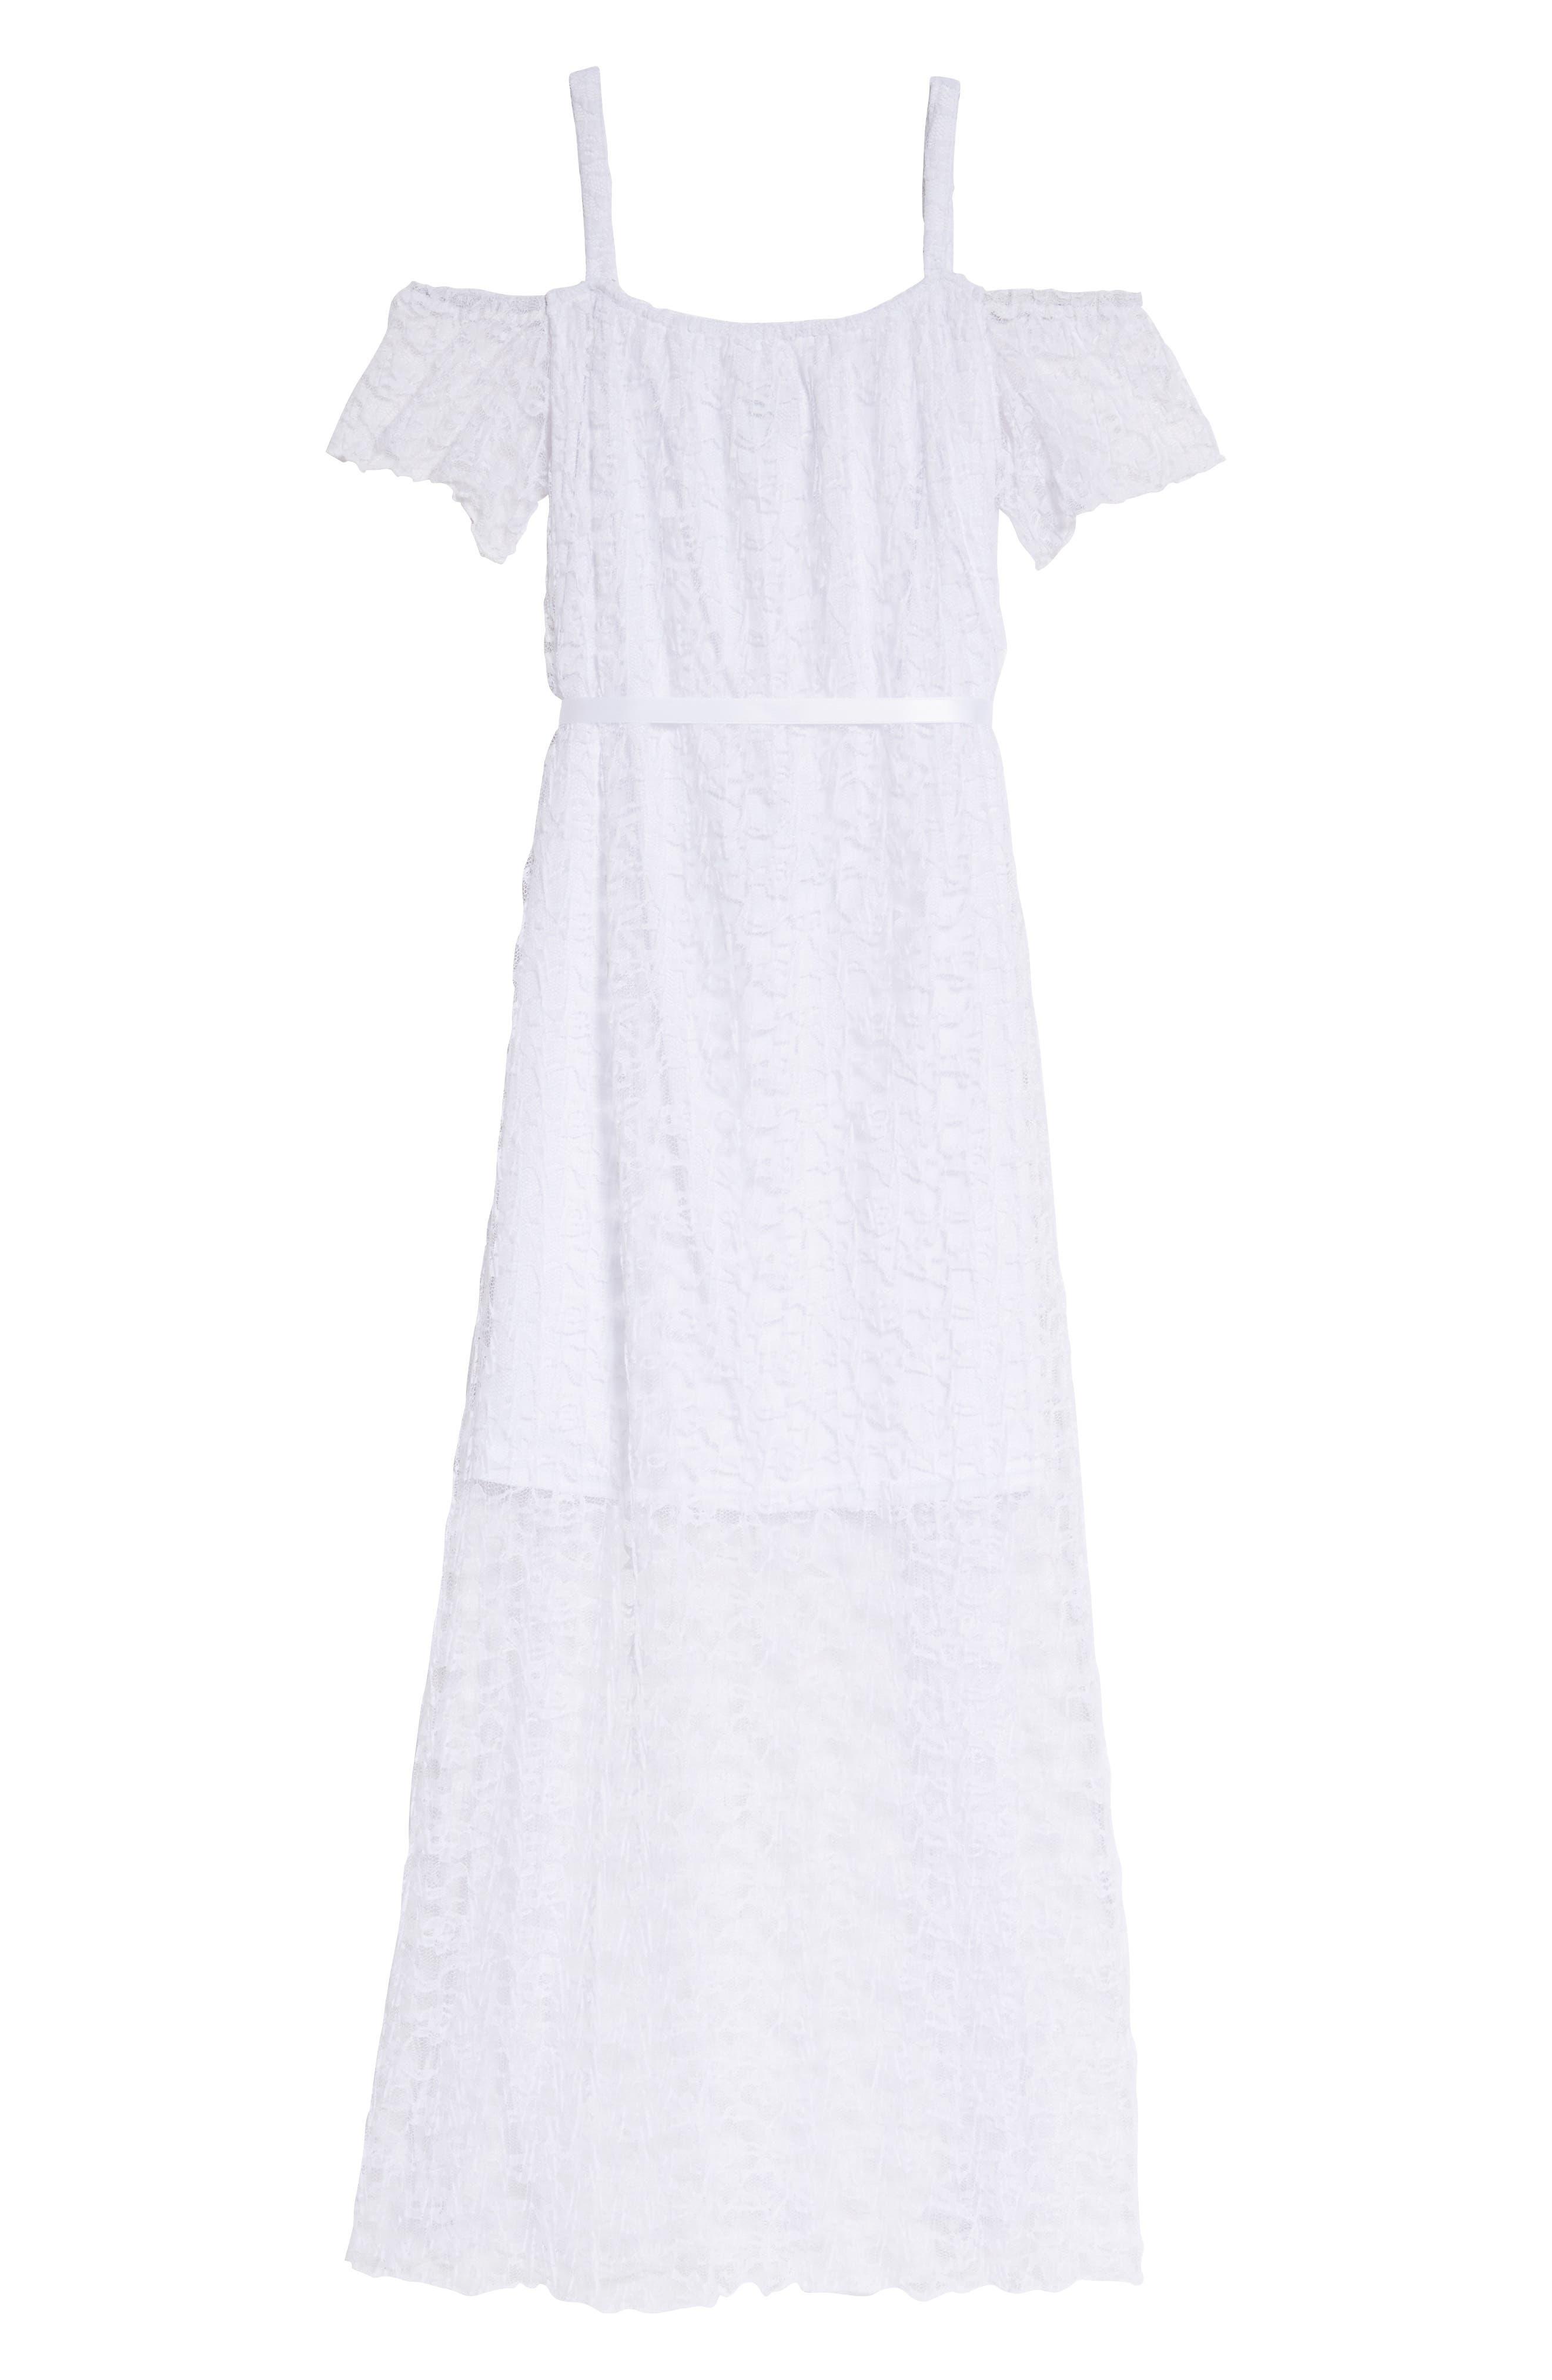 Alternate Image 1 Selected - BLUSH by Us Angels Lace Cold Shoulder Maxi Dress (Big Girls)